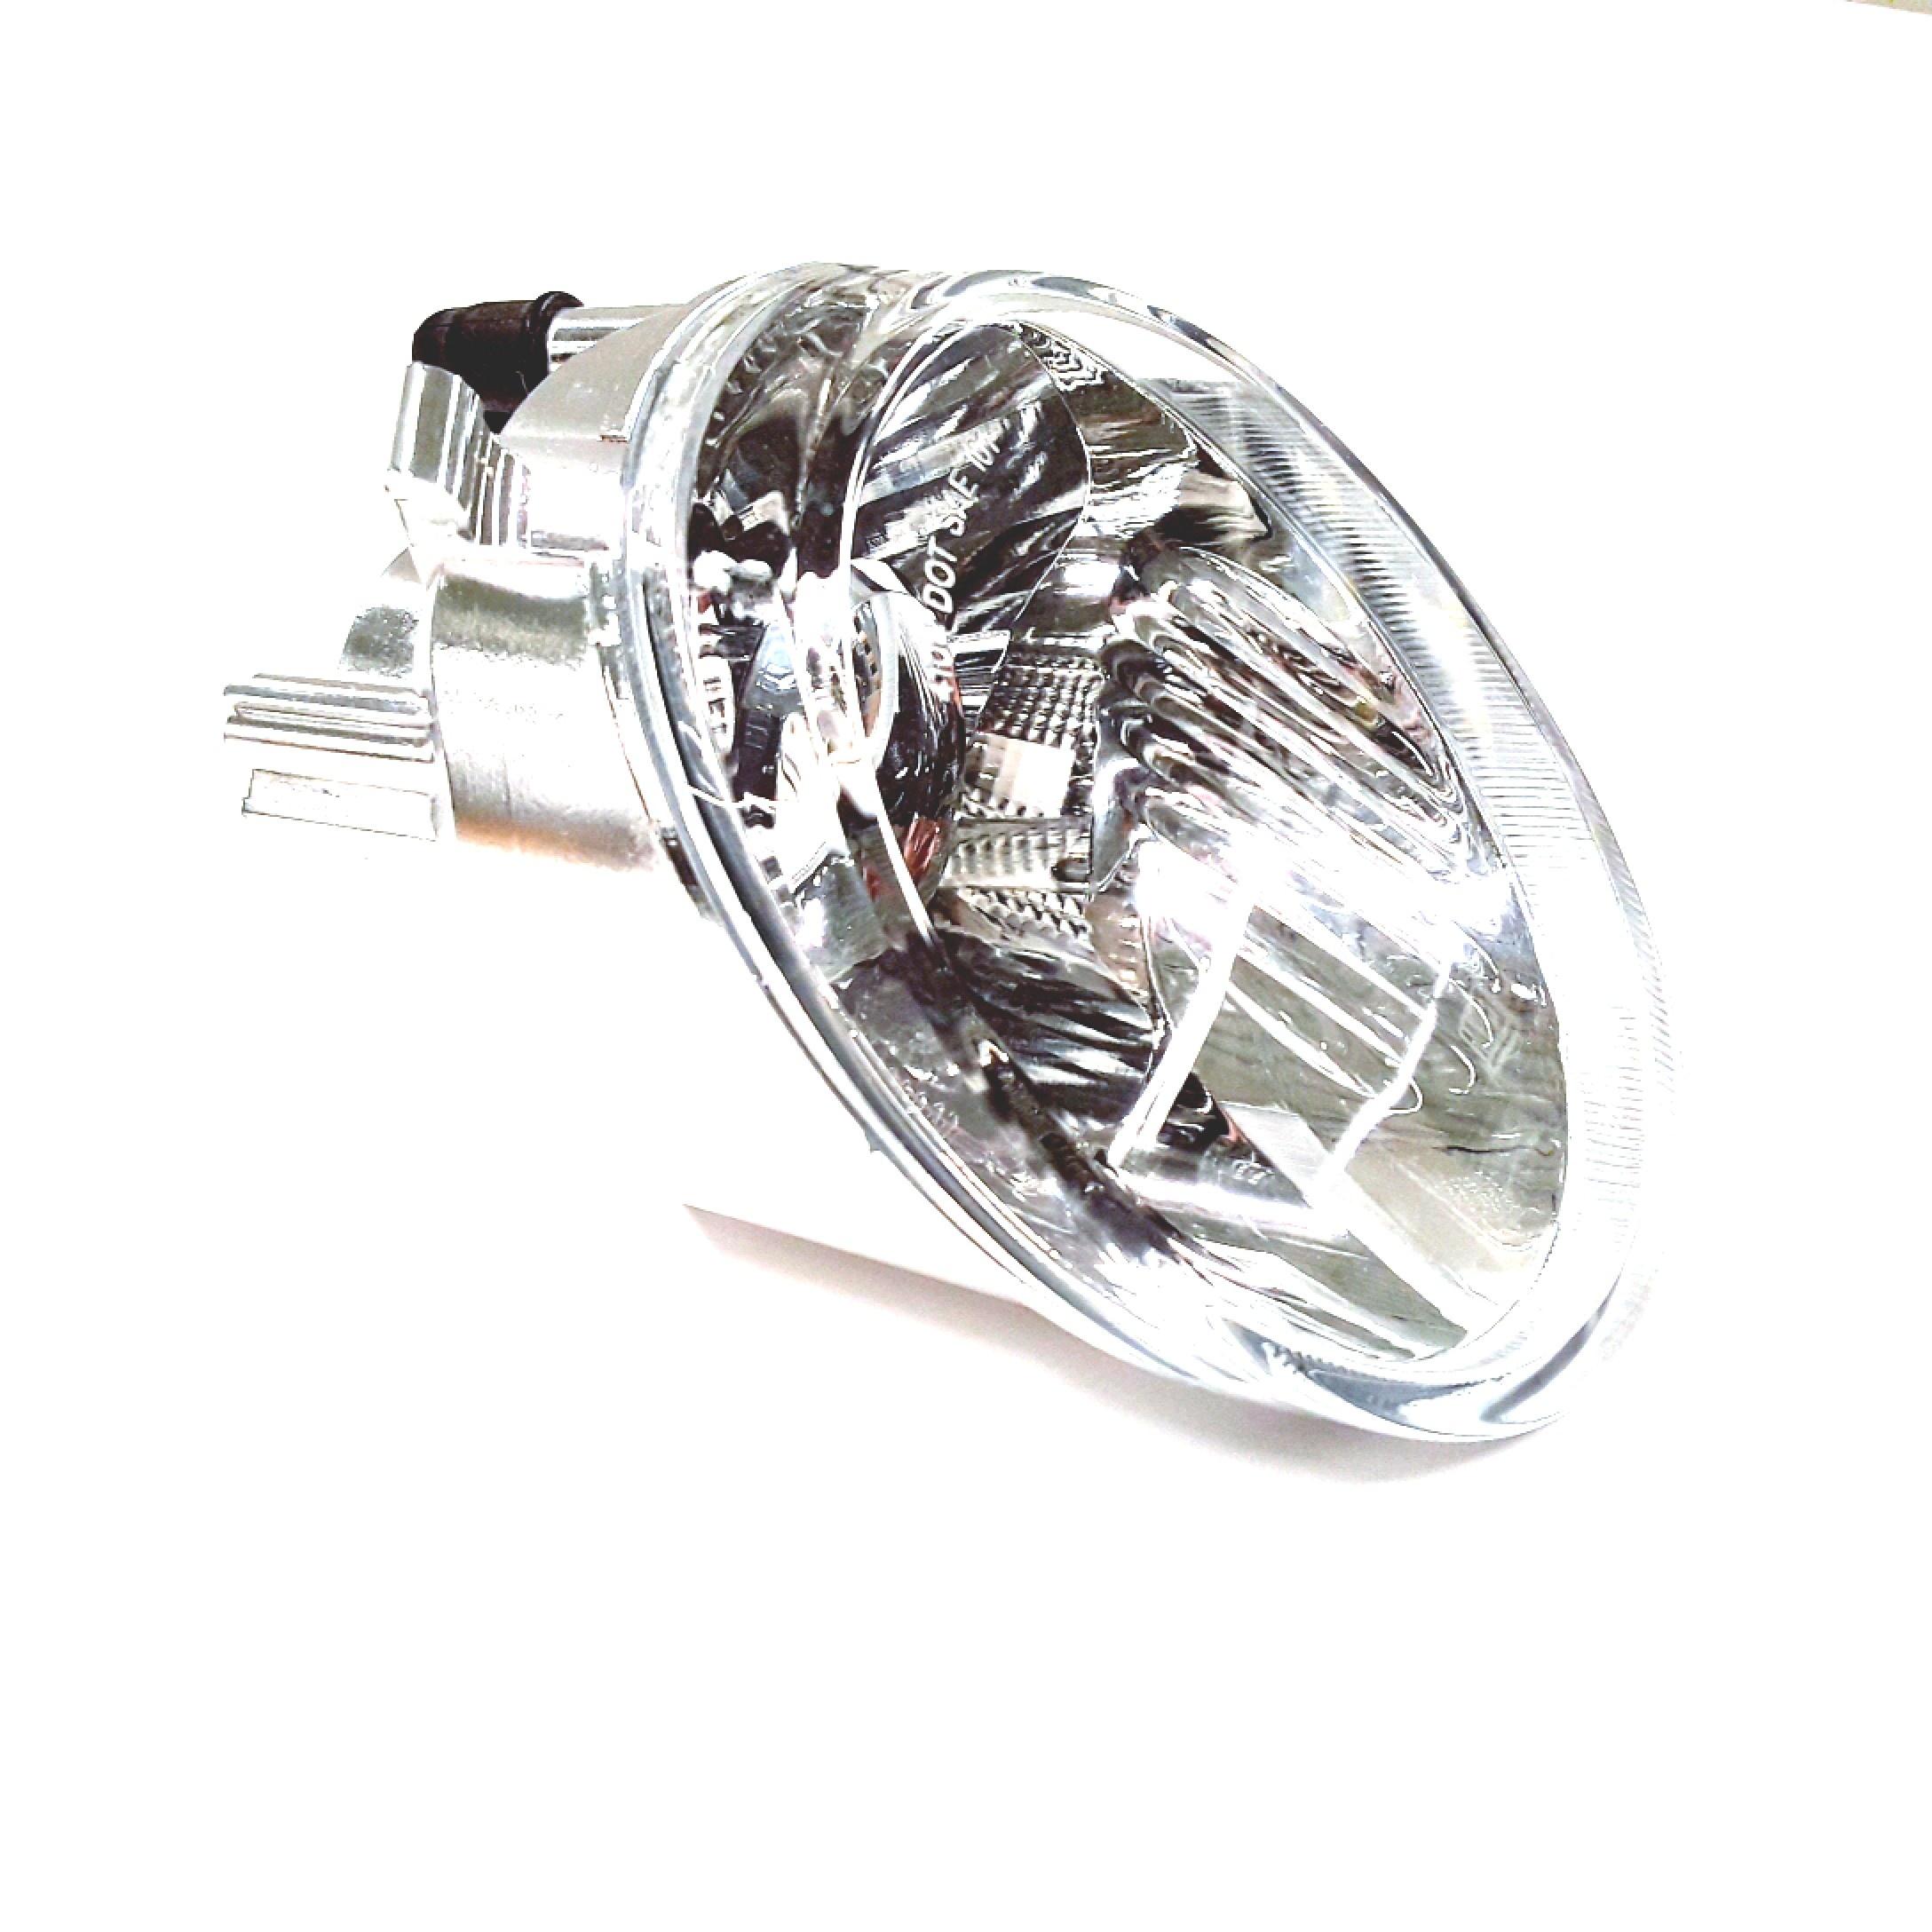 2004 volkswagen beetle lamp  signal  turn  1998